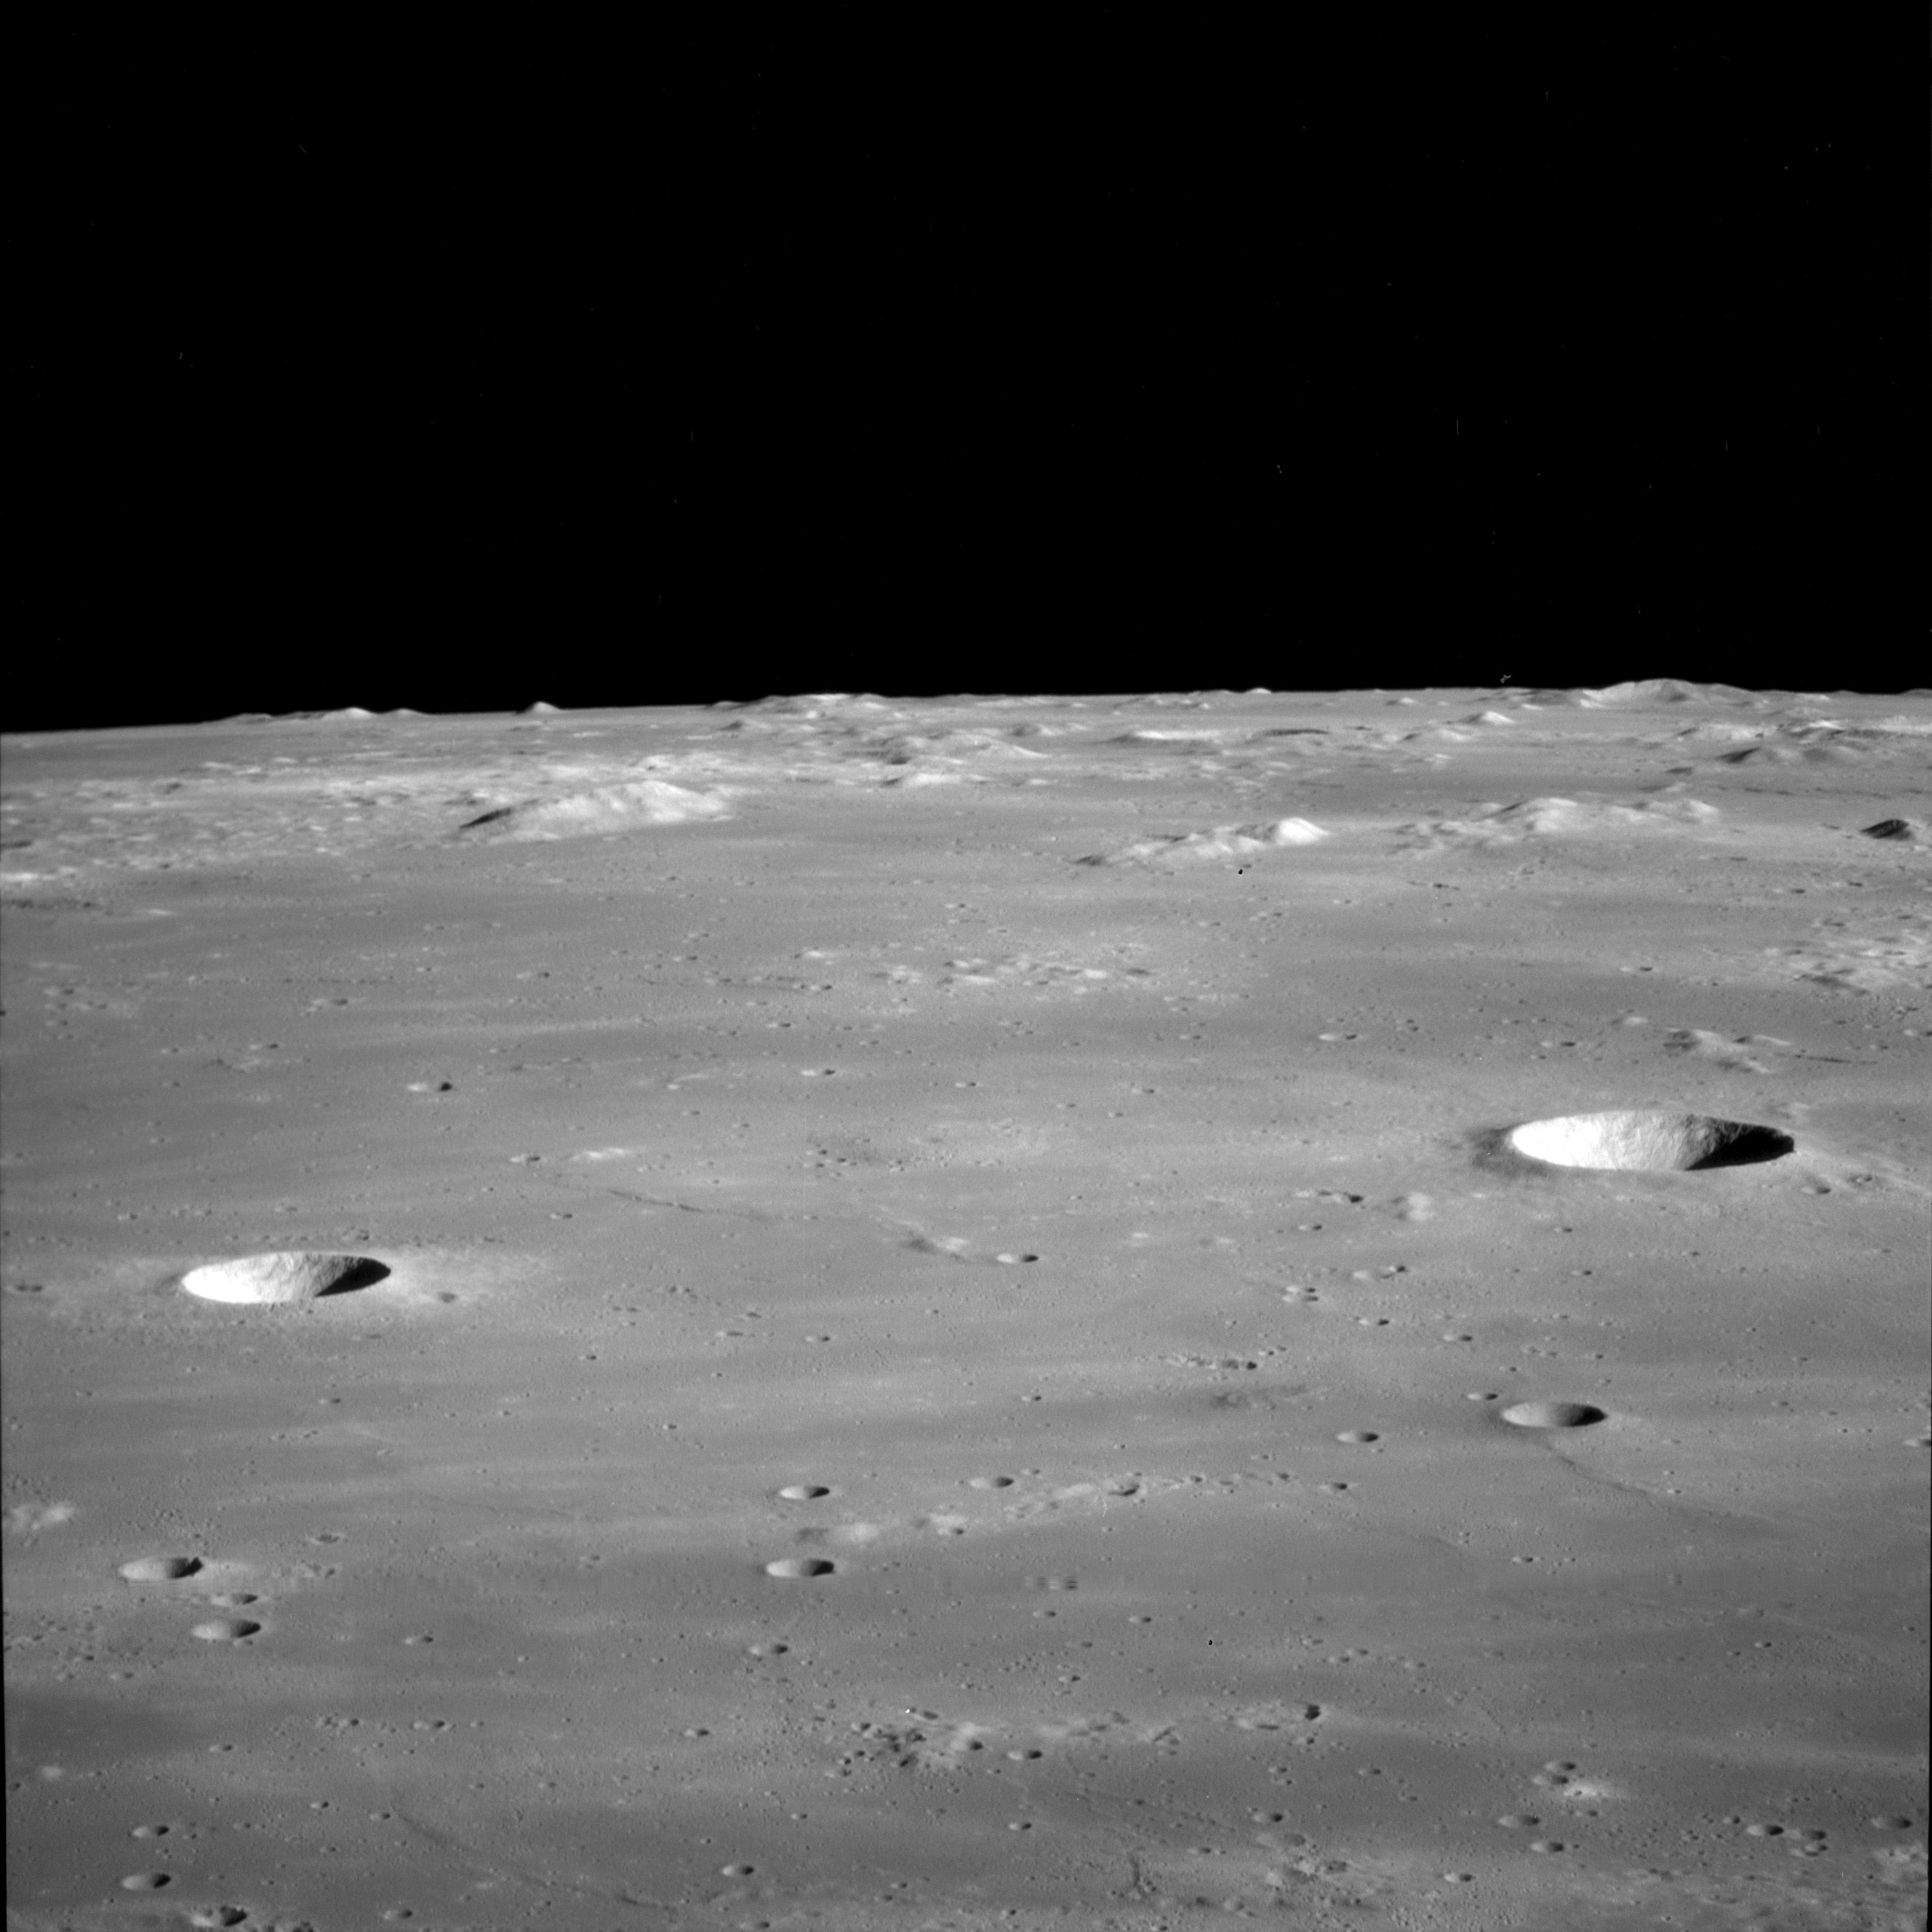 The Moon | Lunar (moon) surface | Lunar moon, Moon surface ...